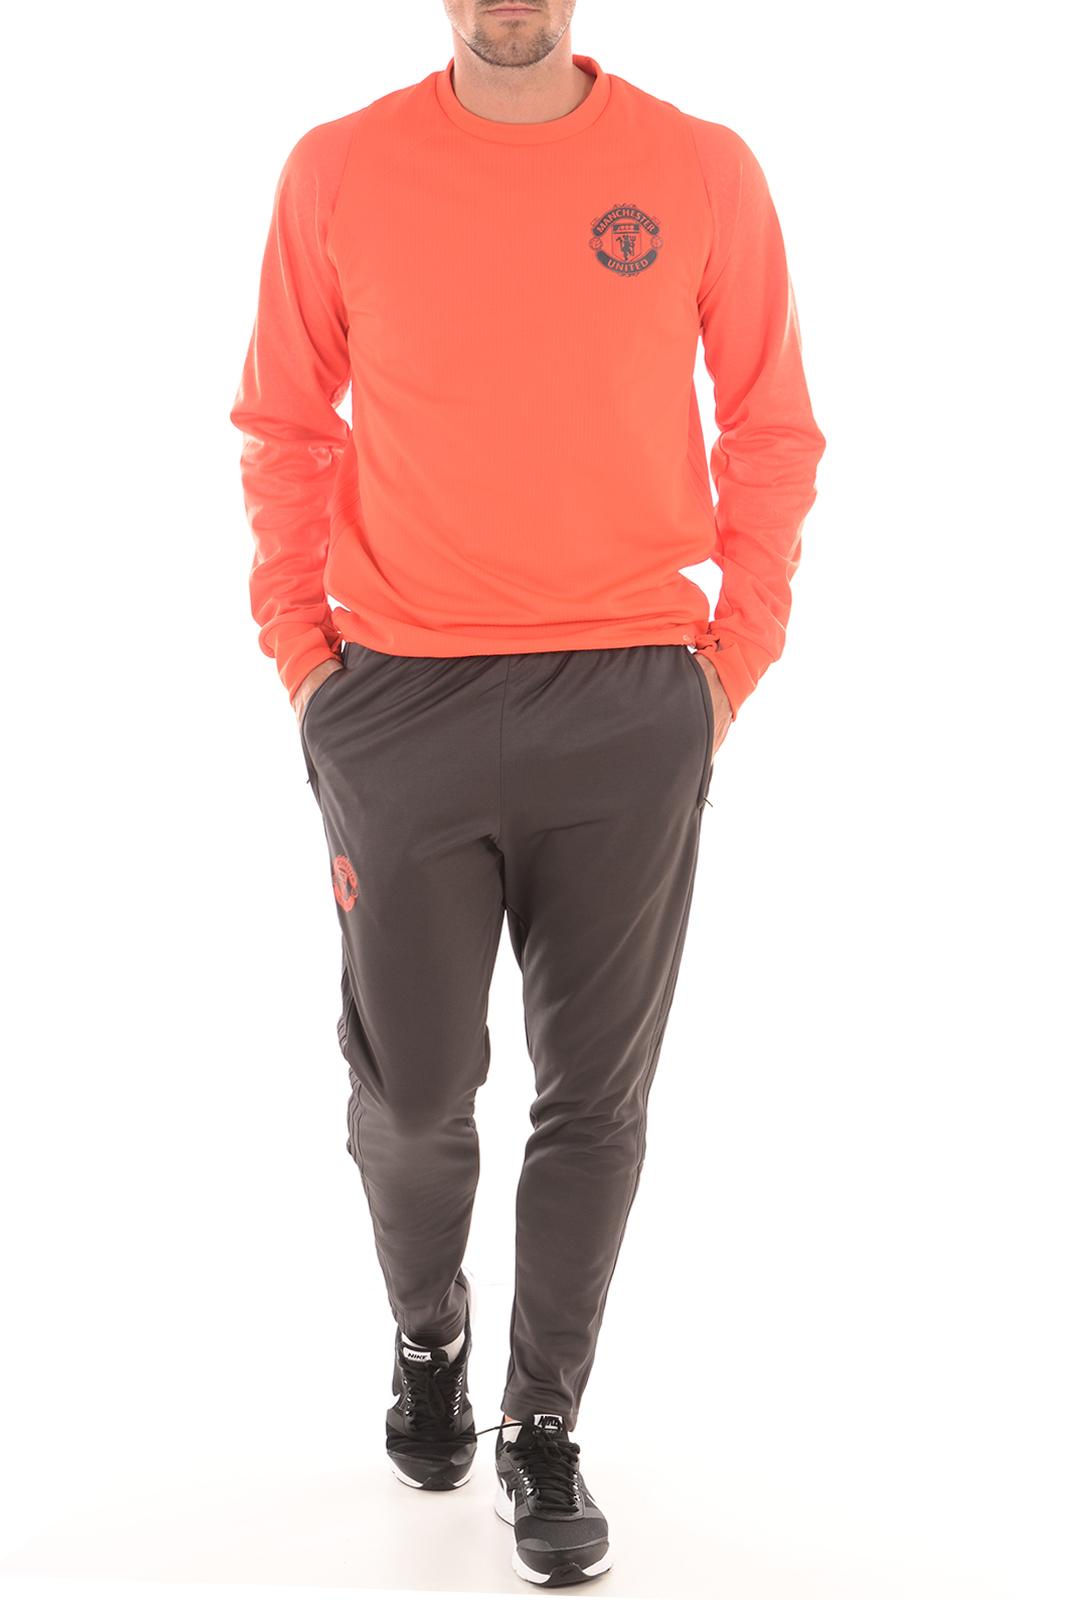 Pulls & Gilets  Adidas AP1047 SWEAT MAN UTD EU TRG rouge